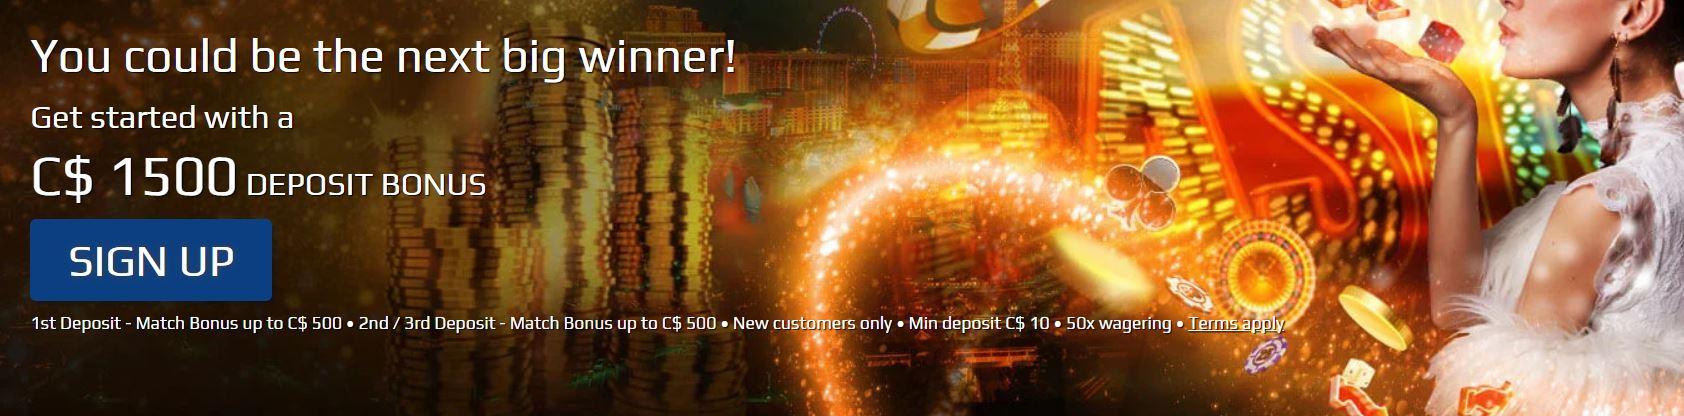 All Slots Casino Canada 2020 Claim C 1500 Welcome Bonus